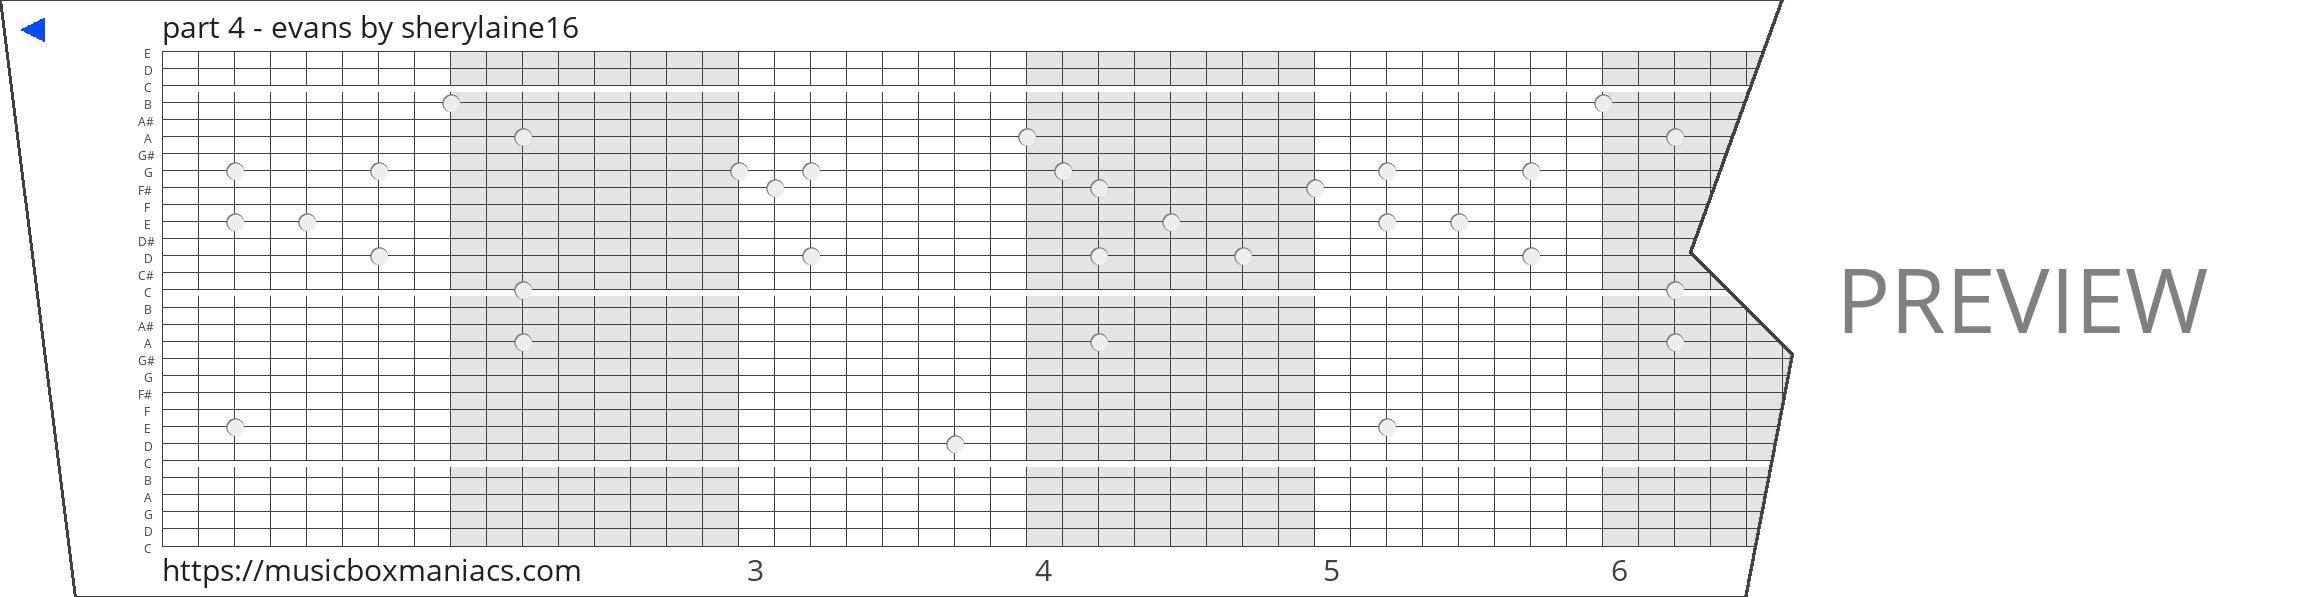 part 4 - evans 30 note music box paper strip